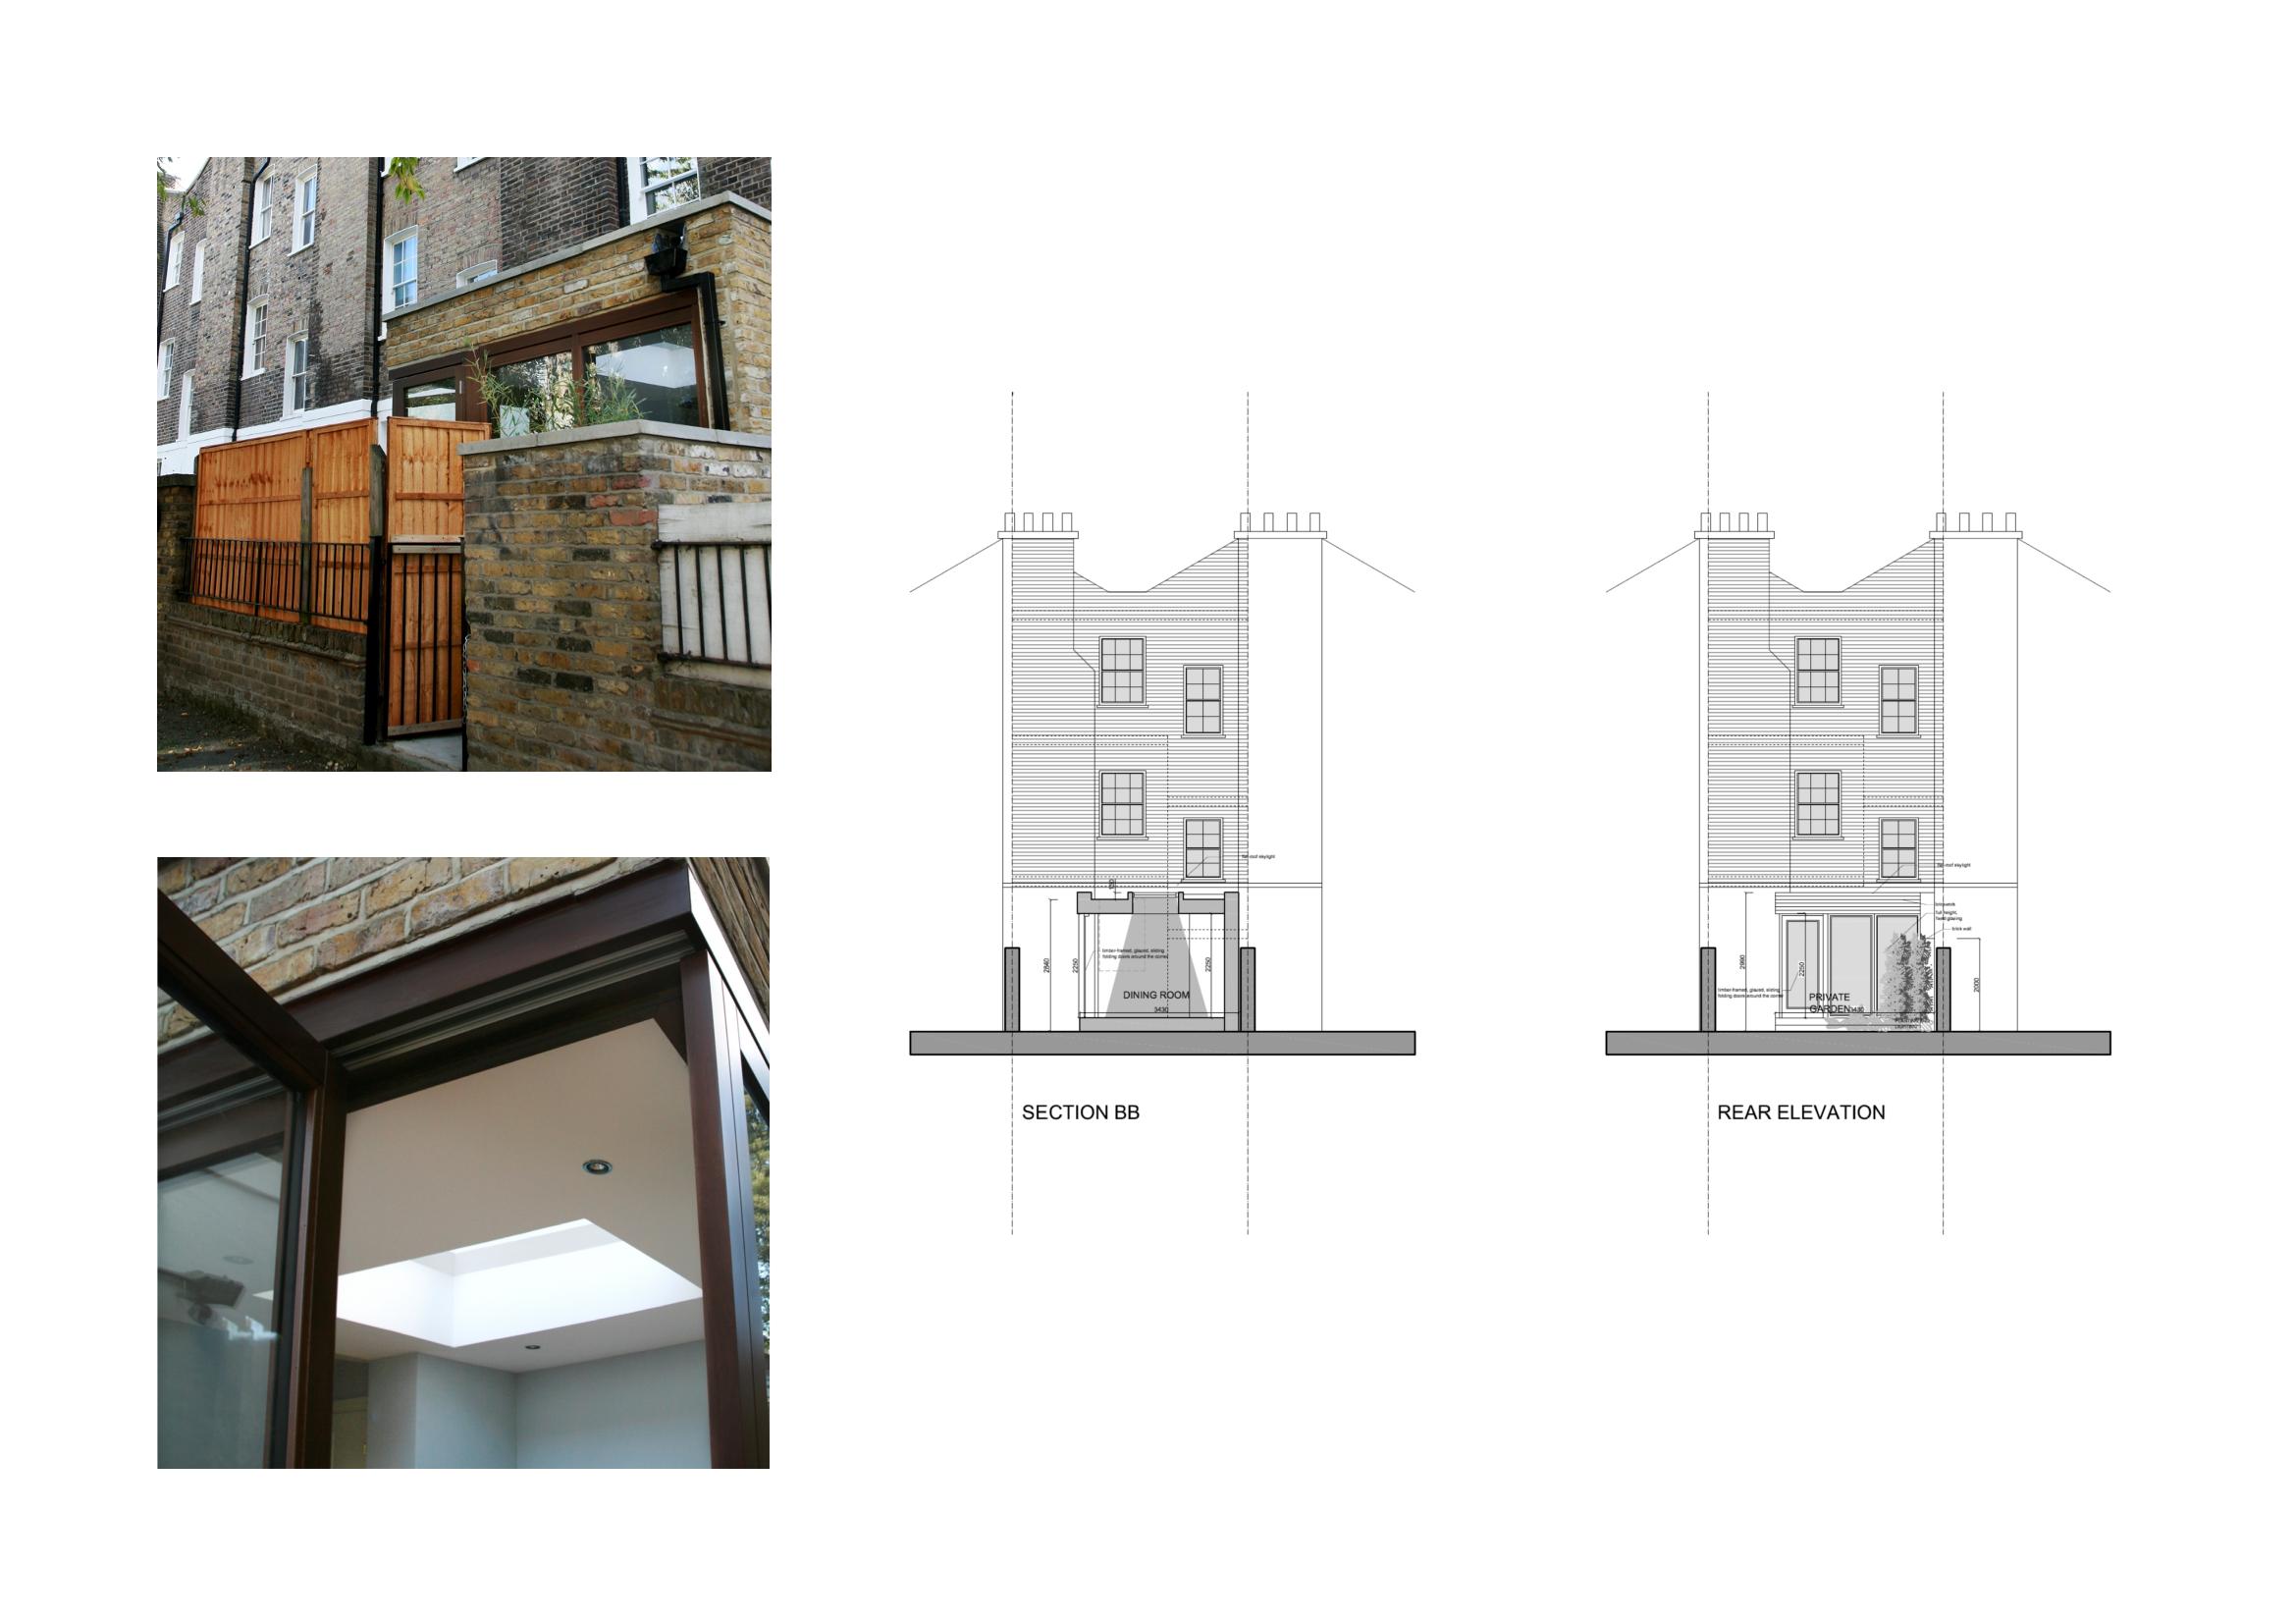 house plans murfreesboro tn homes tips zone